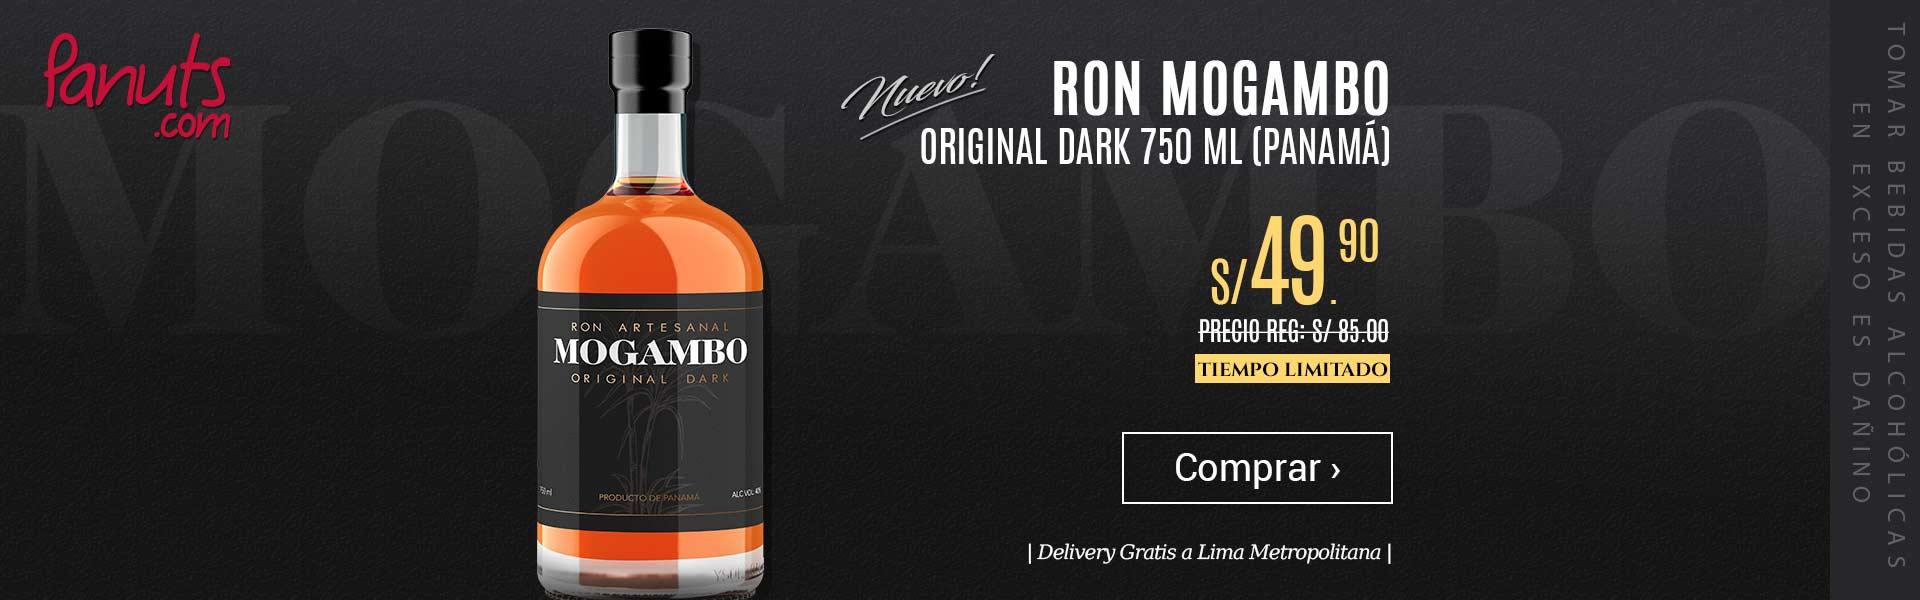 Ron Mogambo